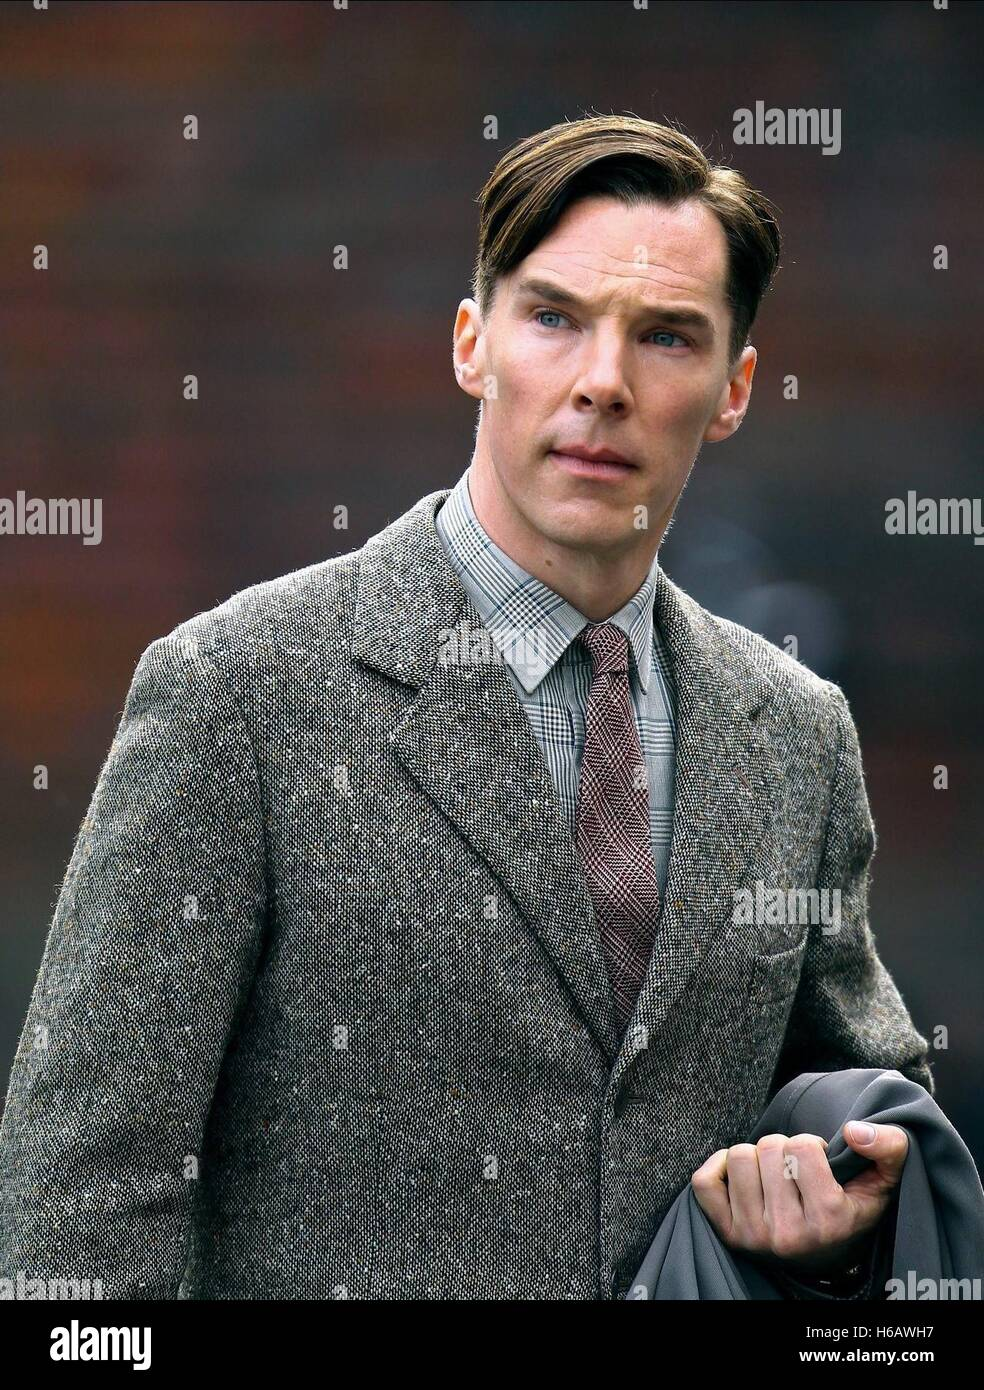 Benedict Cumberbatch The Imitation Game 2014 Stock Photo Alamy